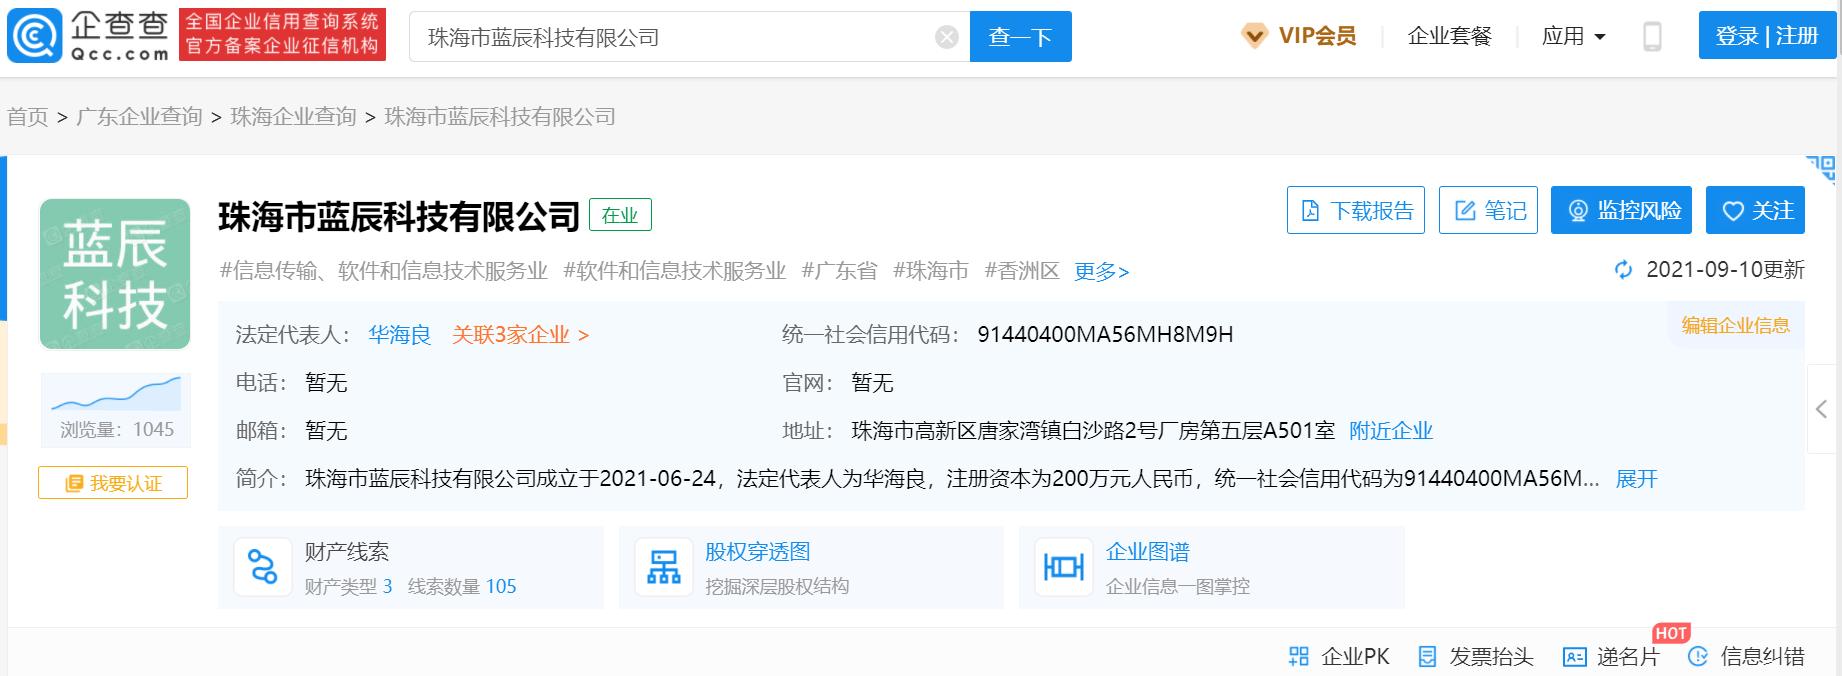 MEIZU副総裁の華海良氏がLanchenの総裁に、MEIZUの孫会社